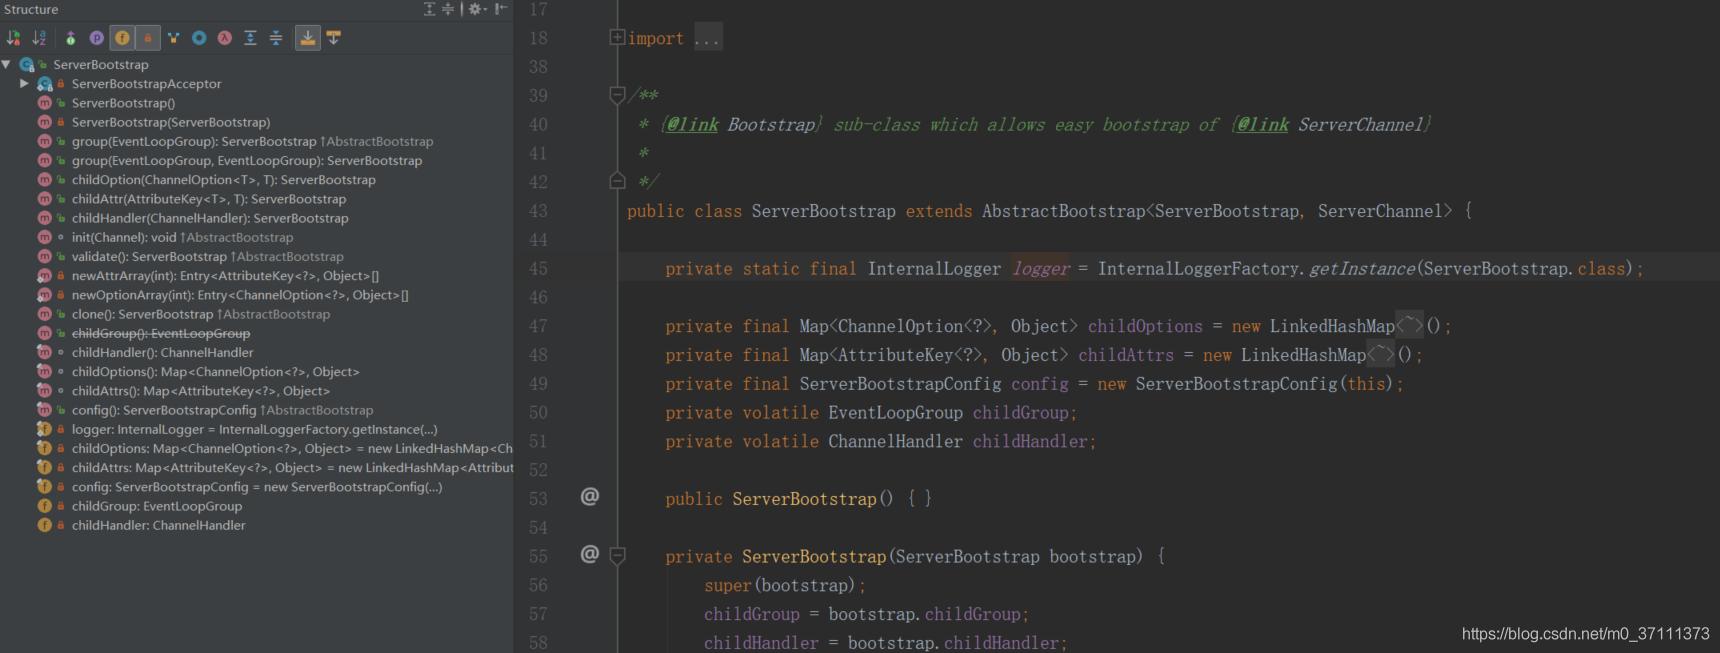 ServerBootstrap的类图